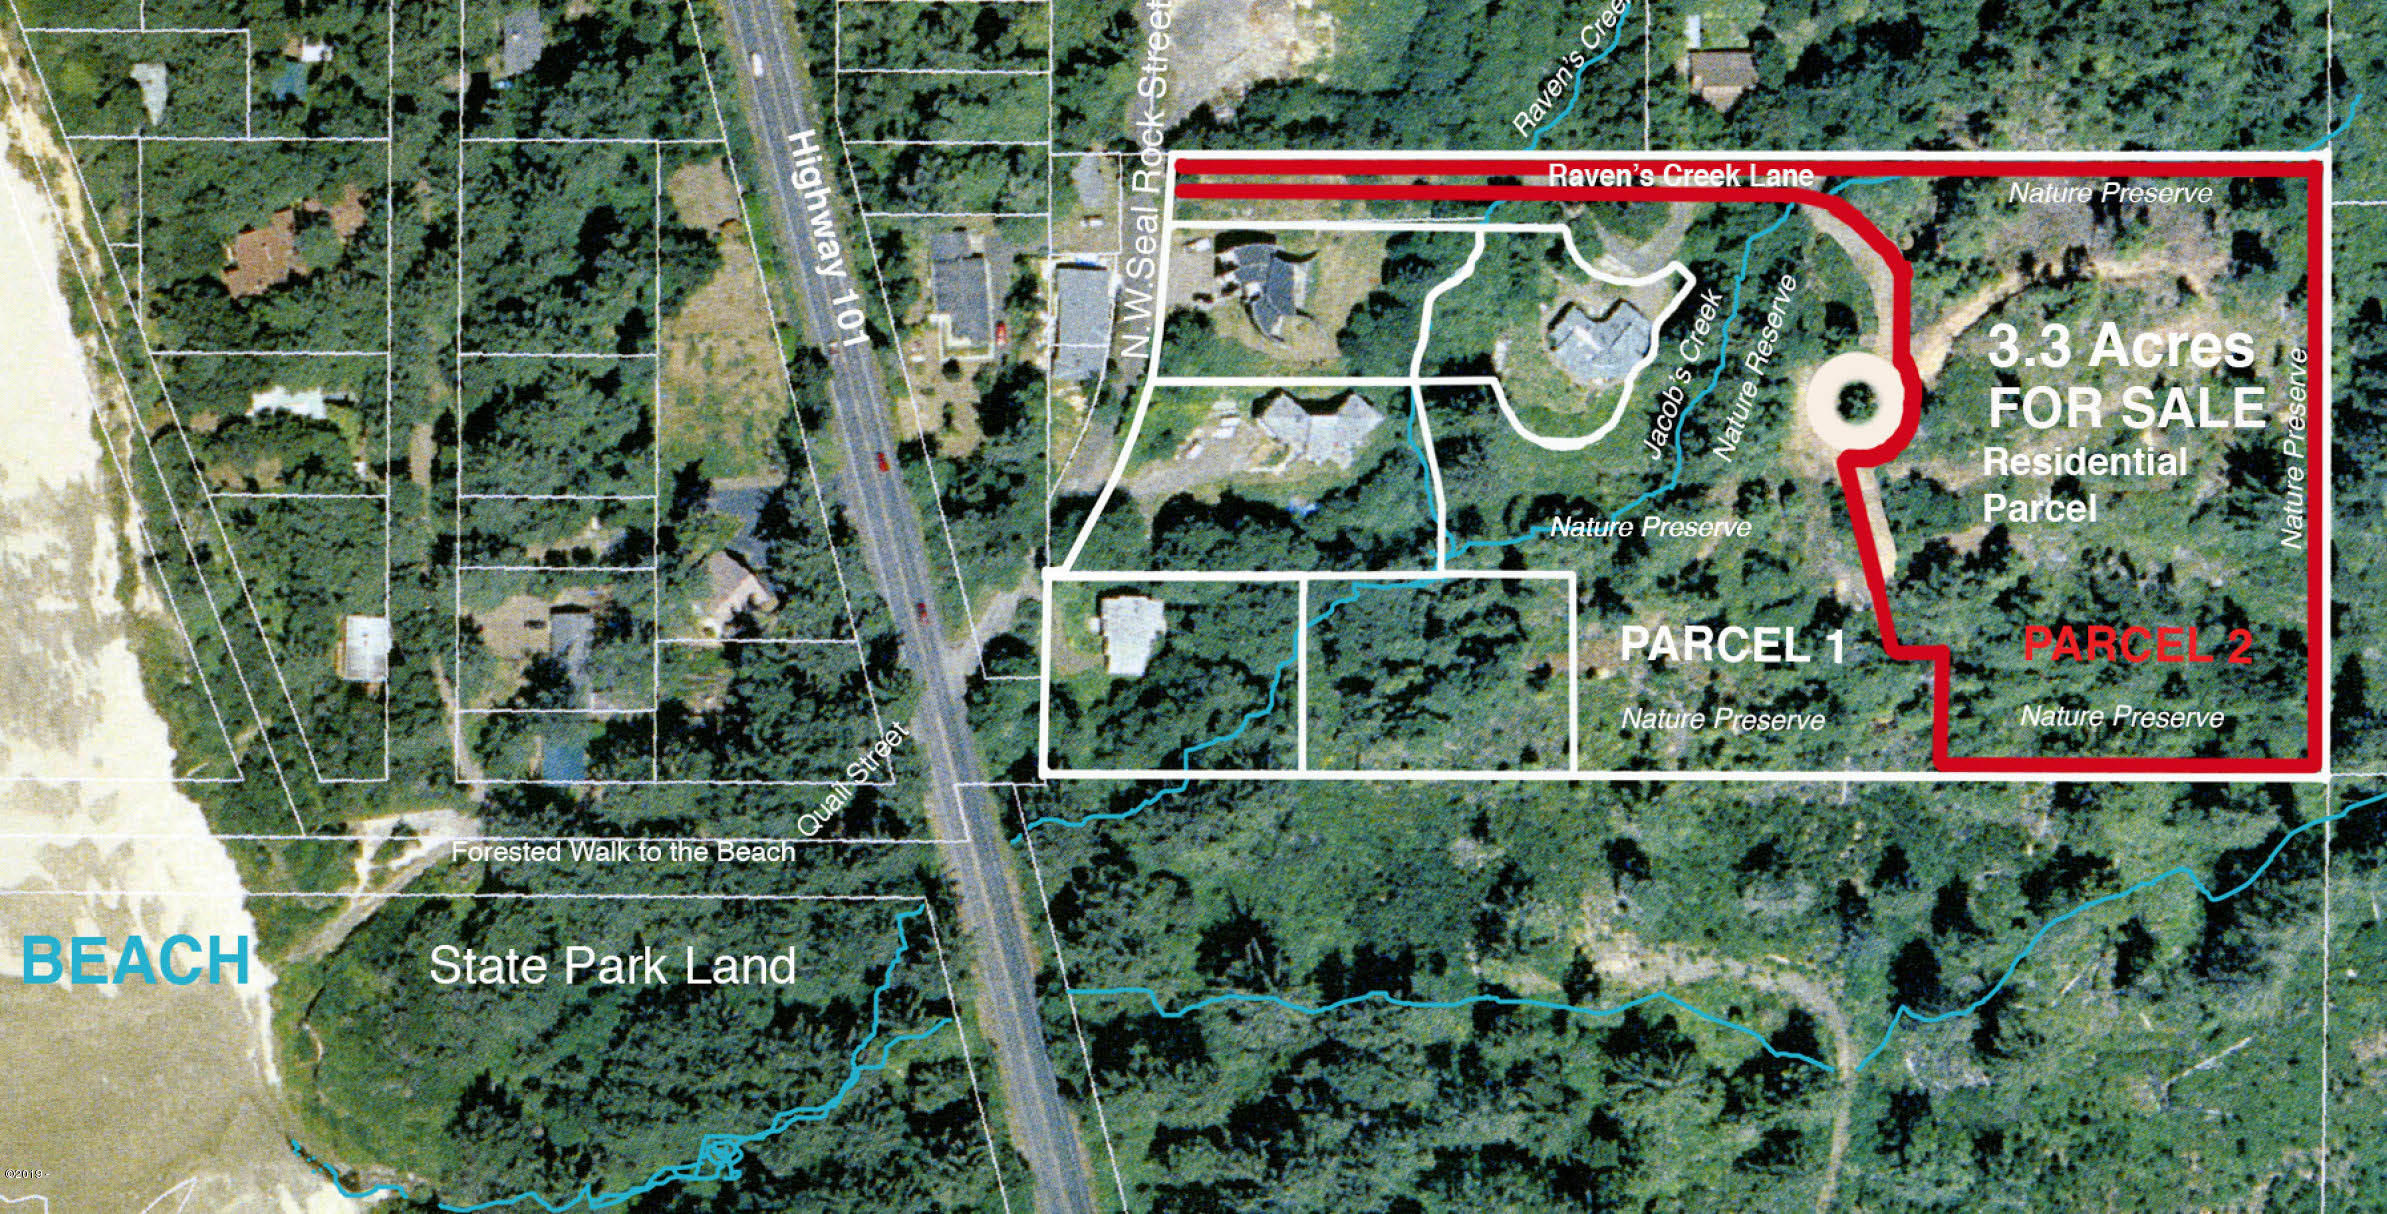 TL 1200 Ravens Creek Lane, Seal Rock, OR 97396 - Overhead